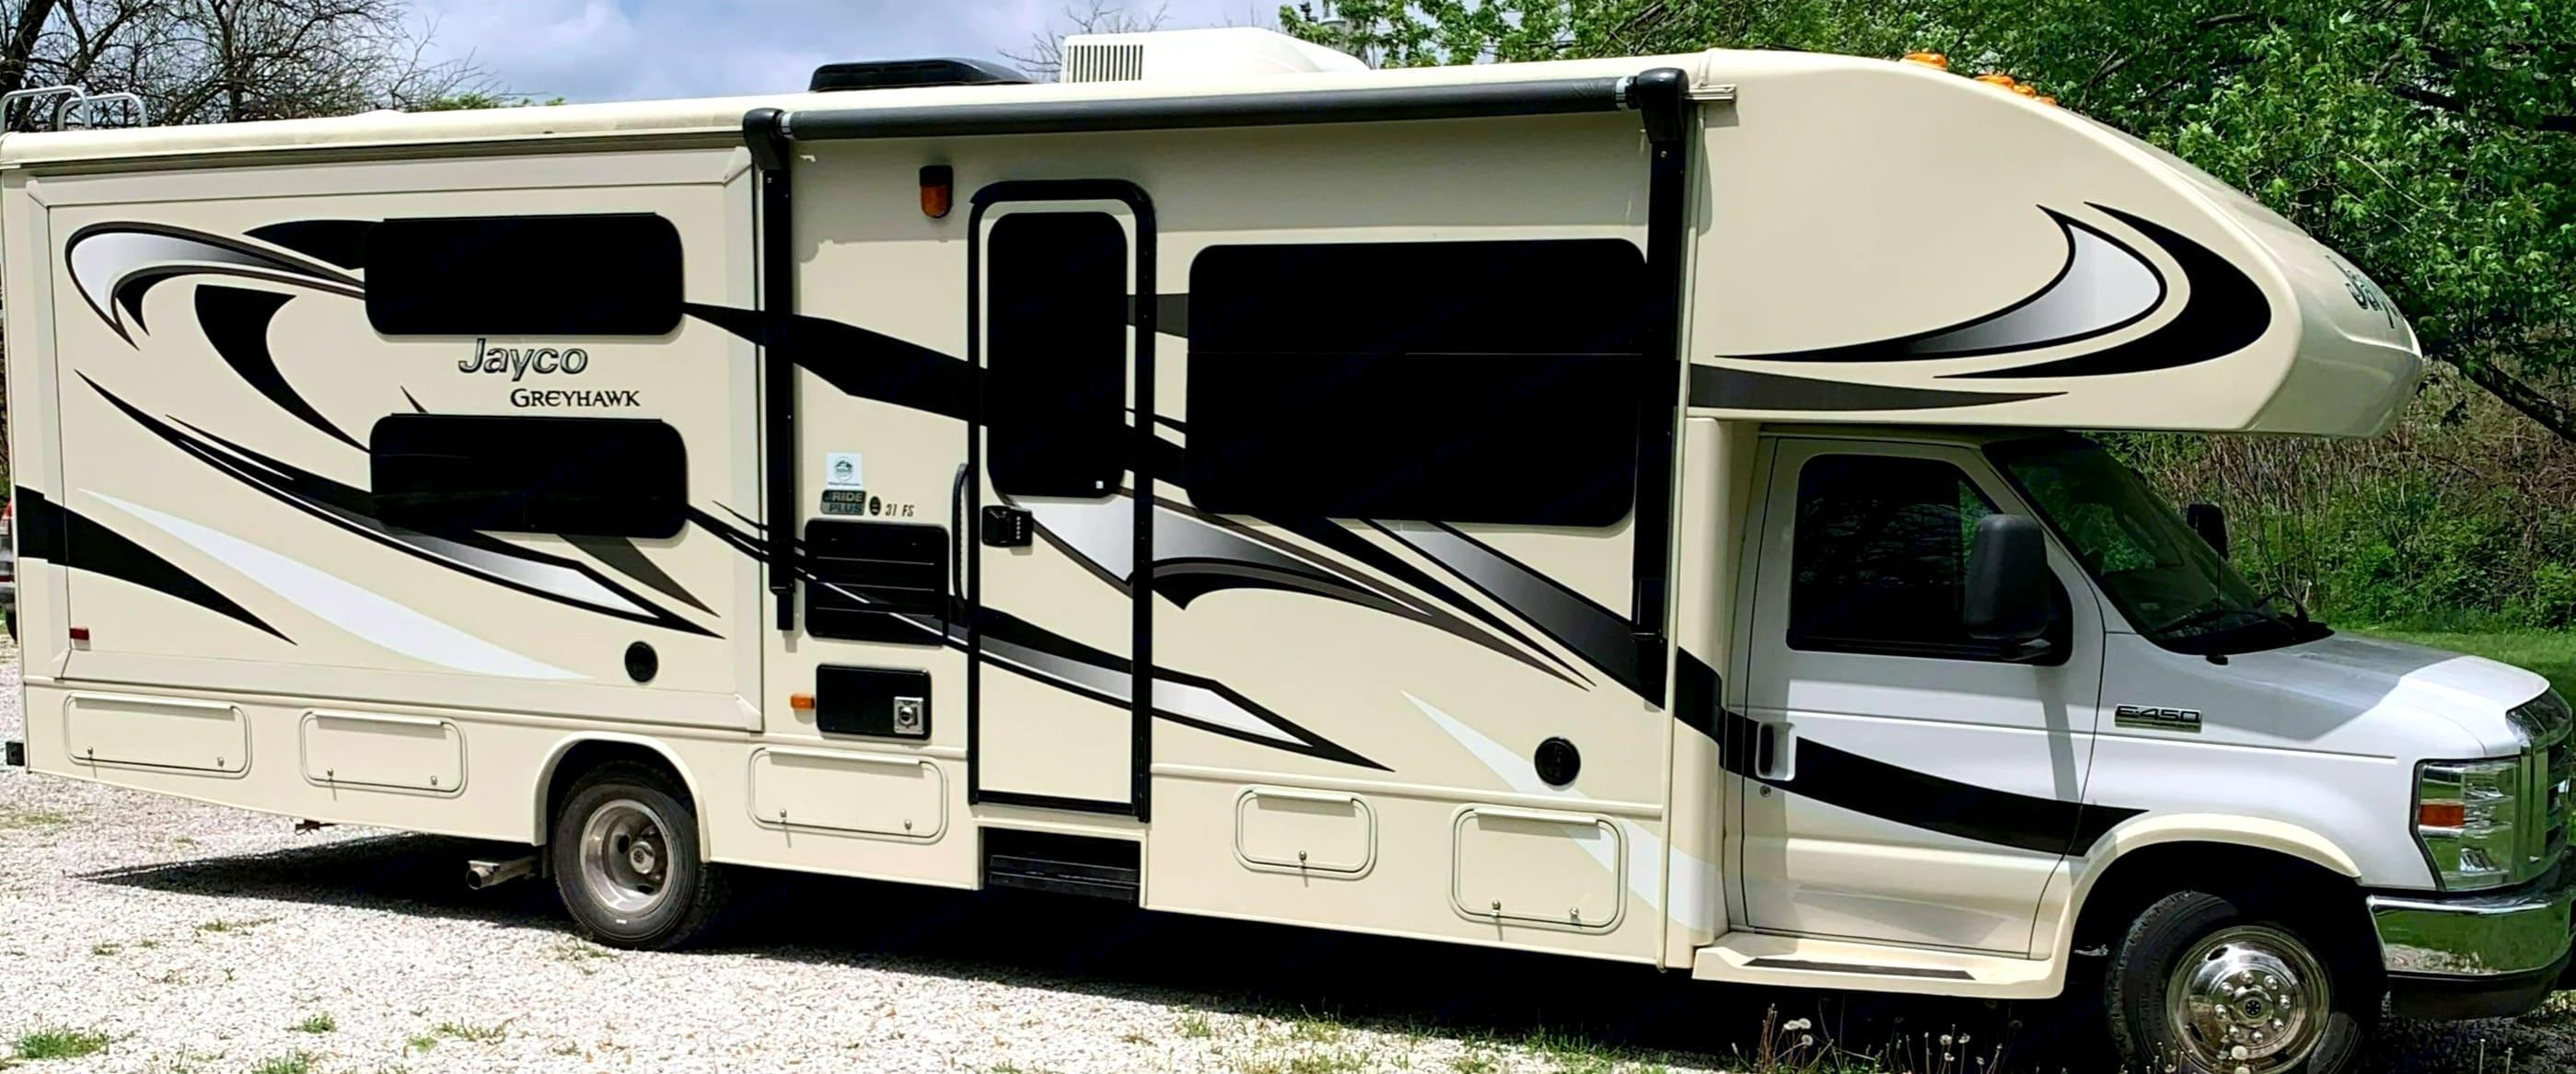 32 feet of luxury riding and camping!. Jayco Greyhawk 2016